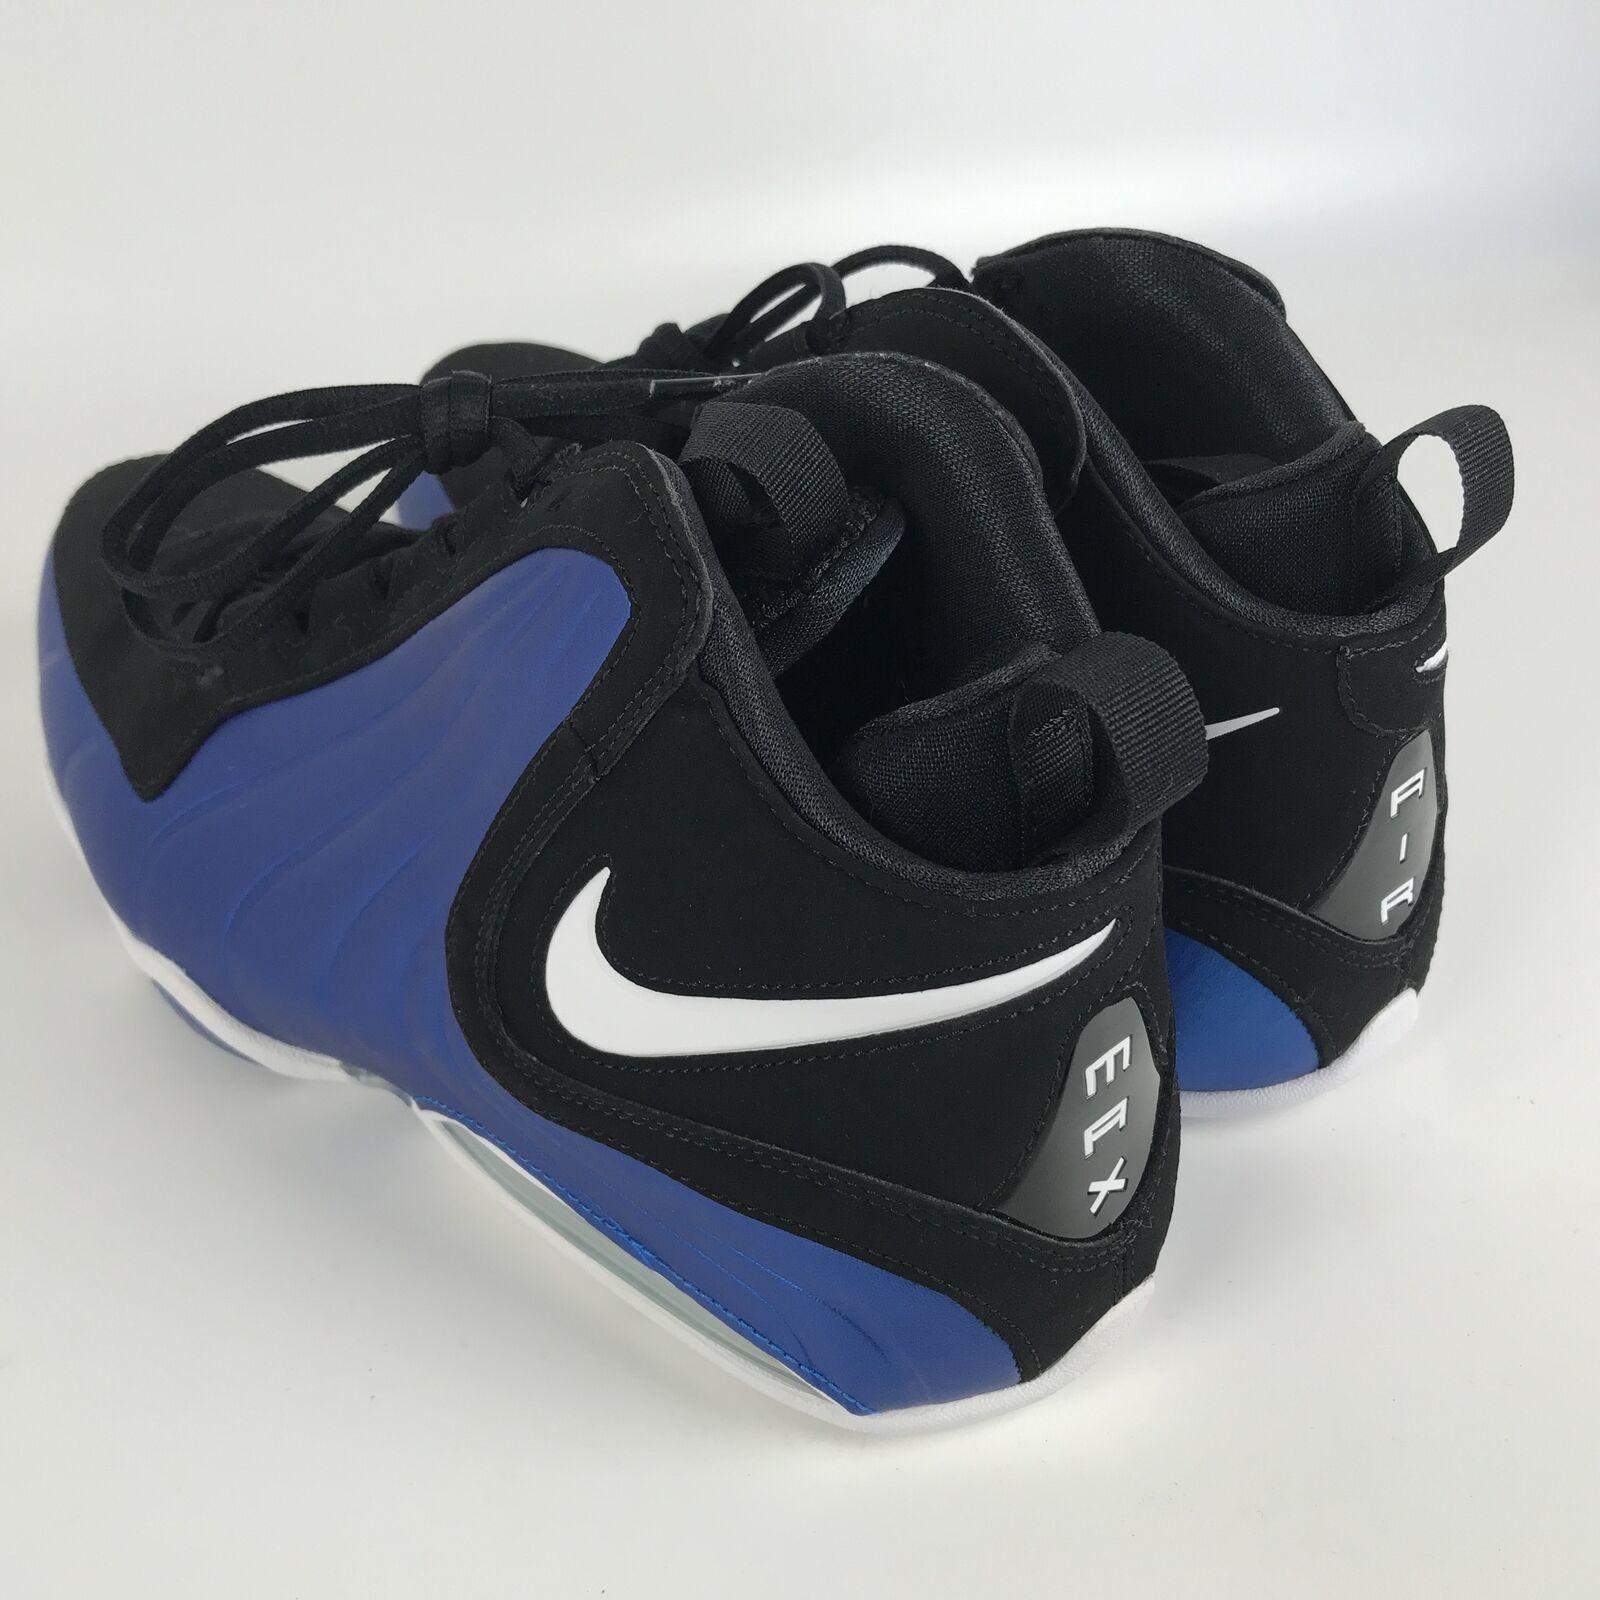 Nike Air Max WAVY Men's size 11 Basketball Shoes Penny Blue Black AV8061 002 image 4